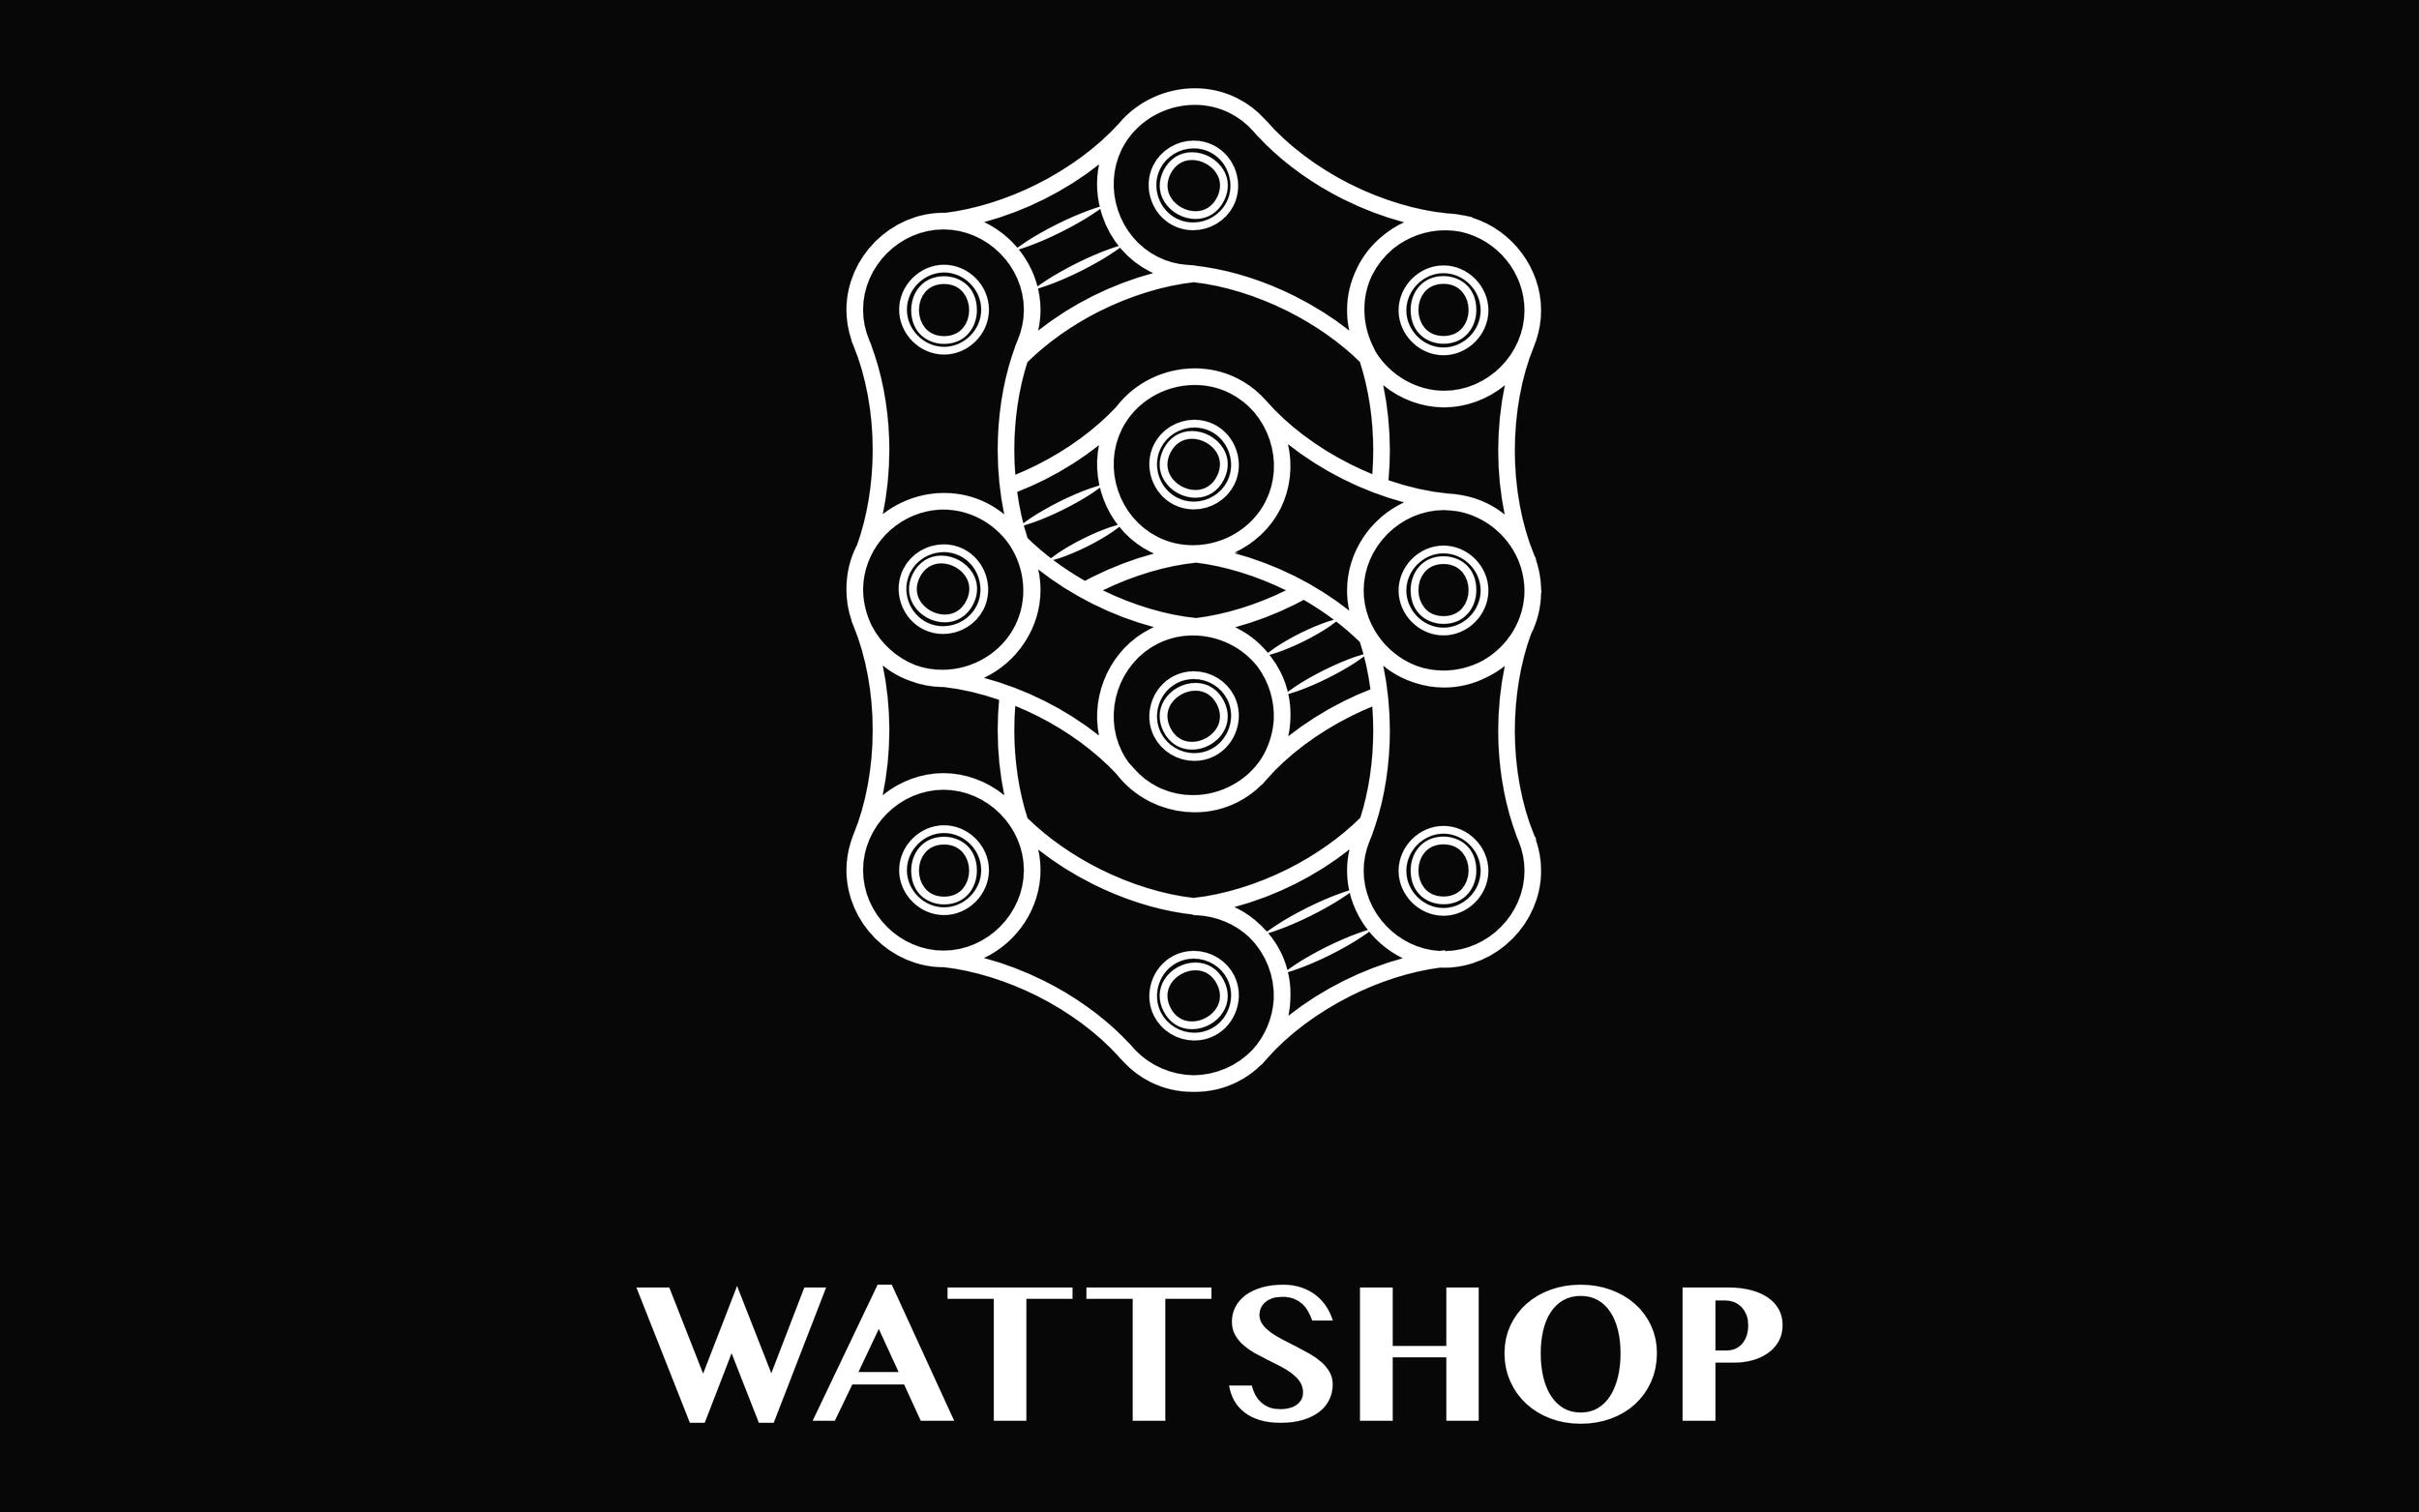 wattshop.png